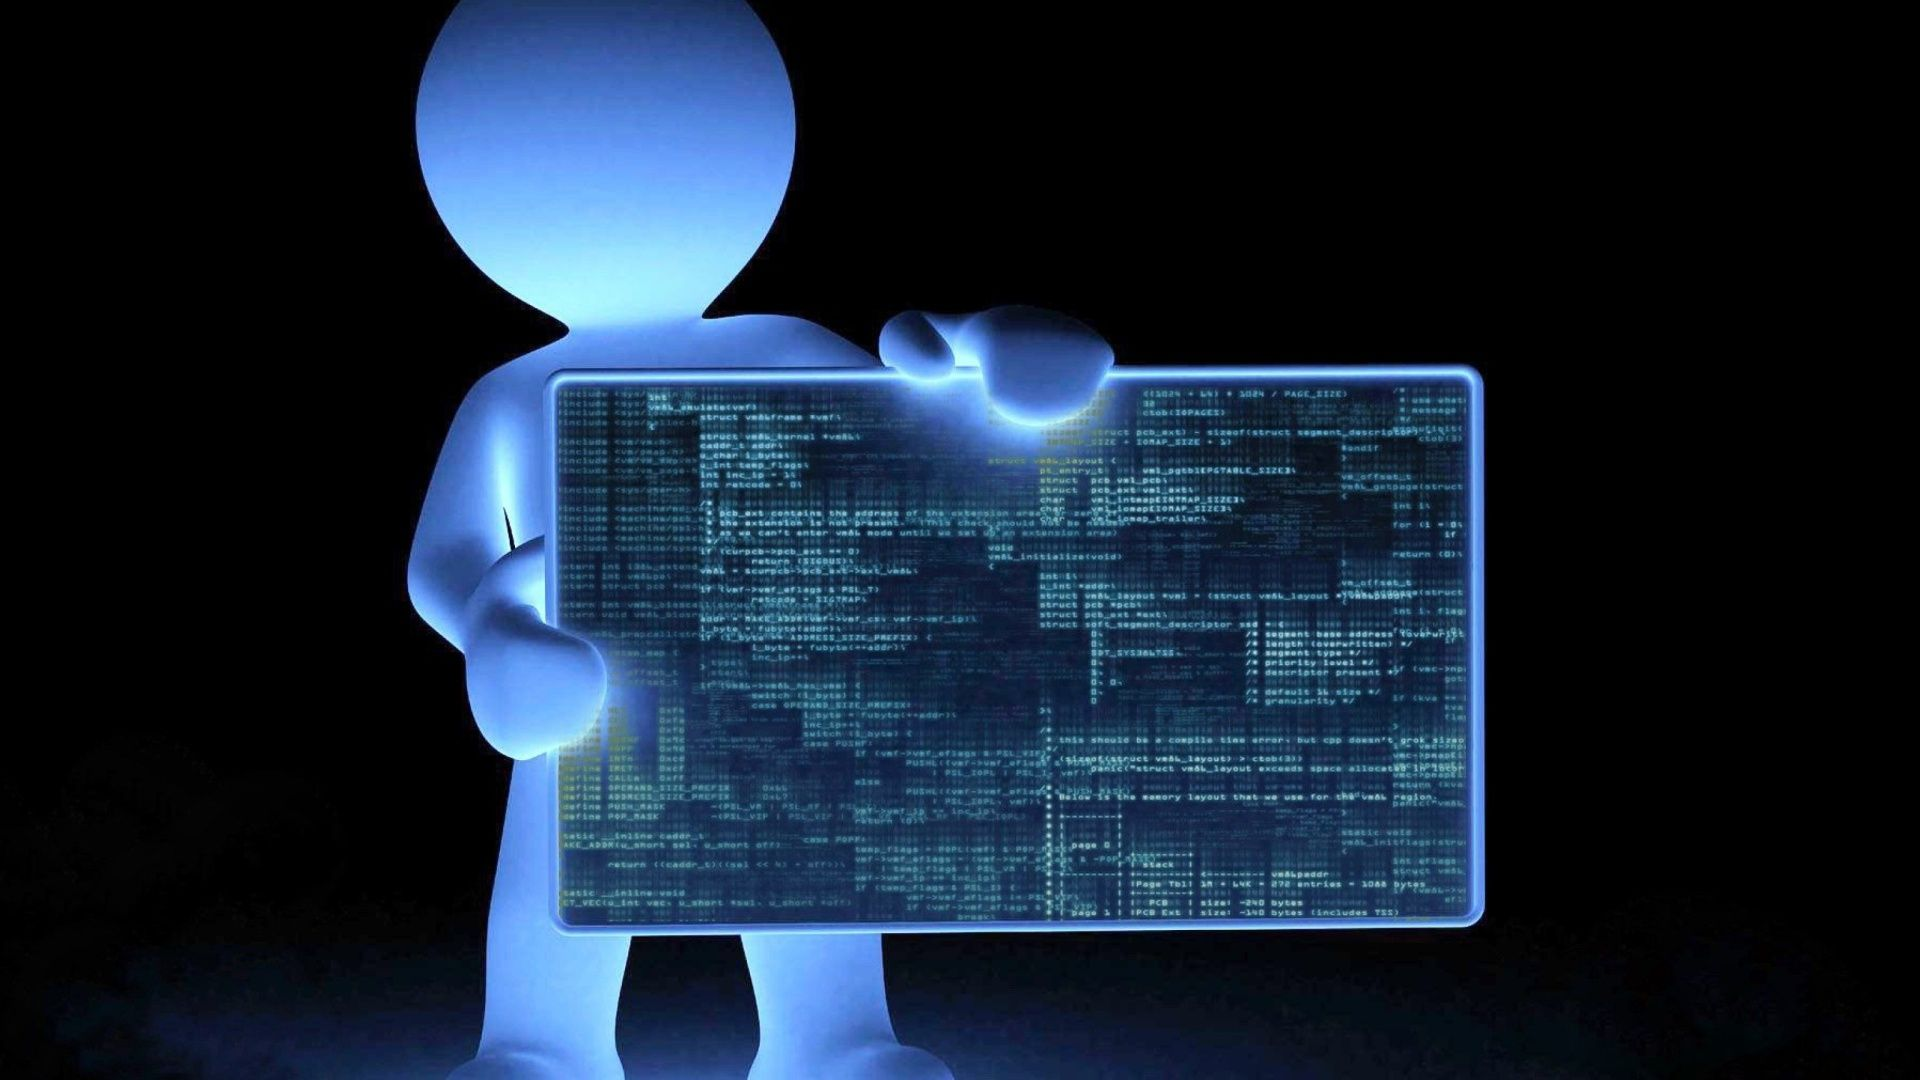 Programming wallpaper background